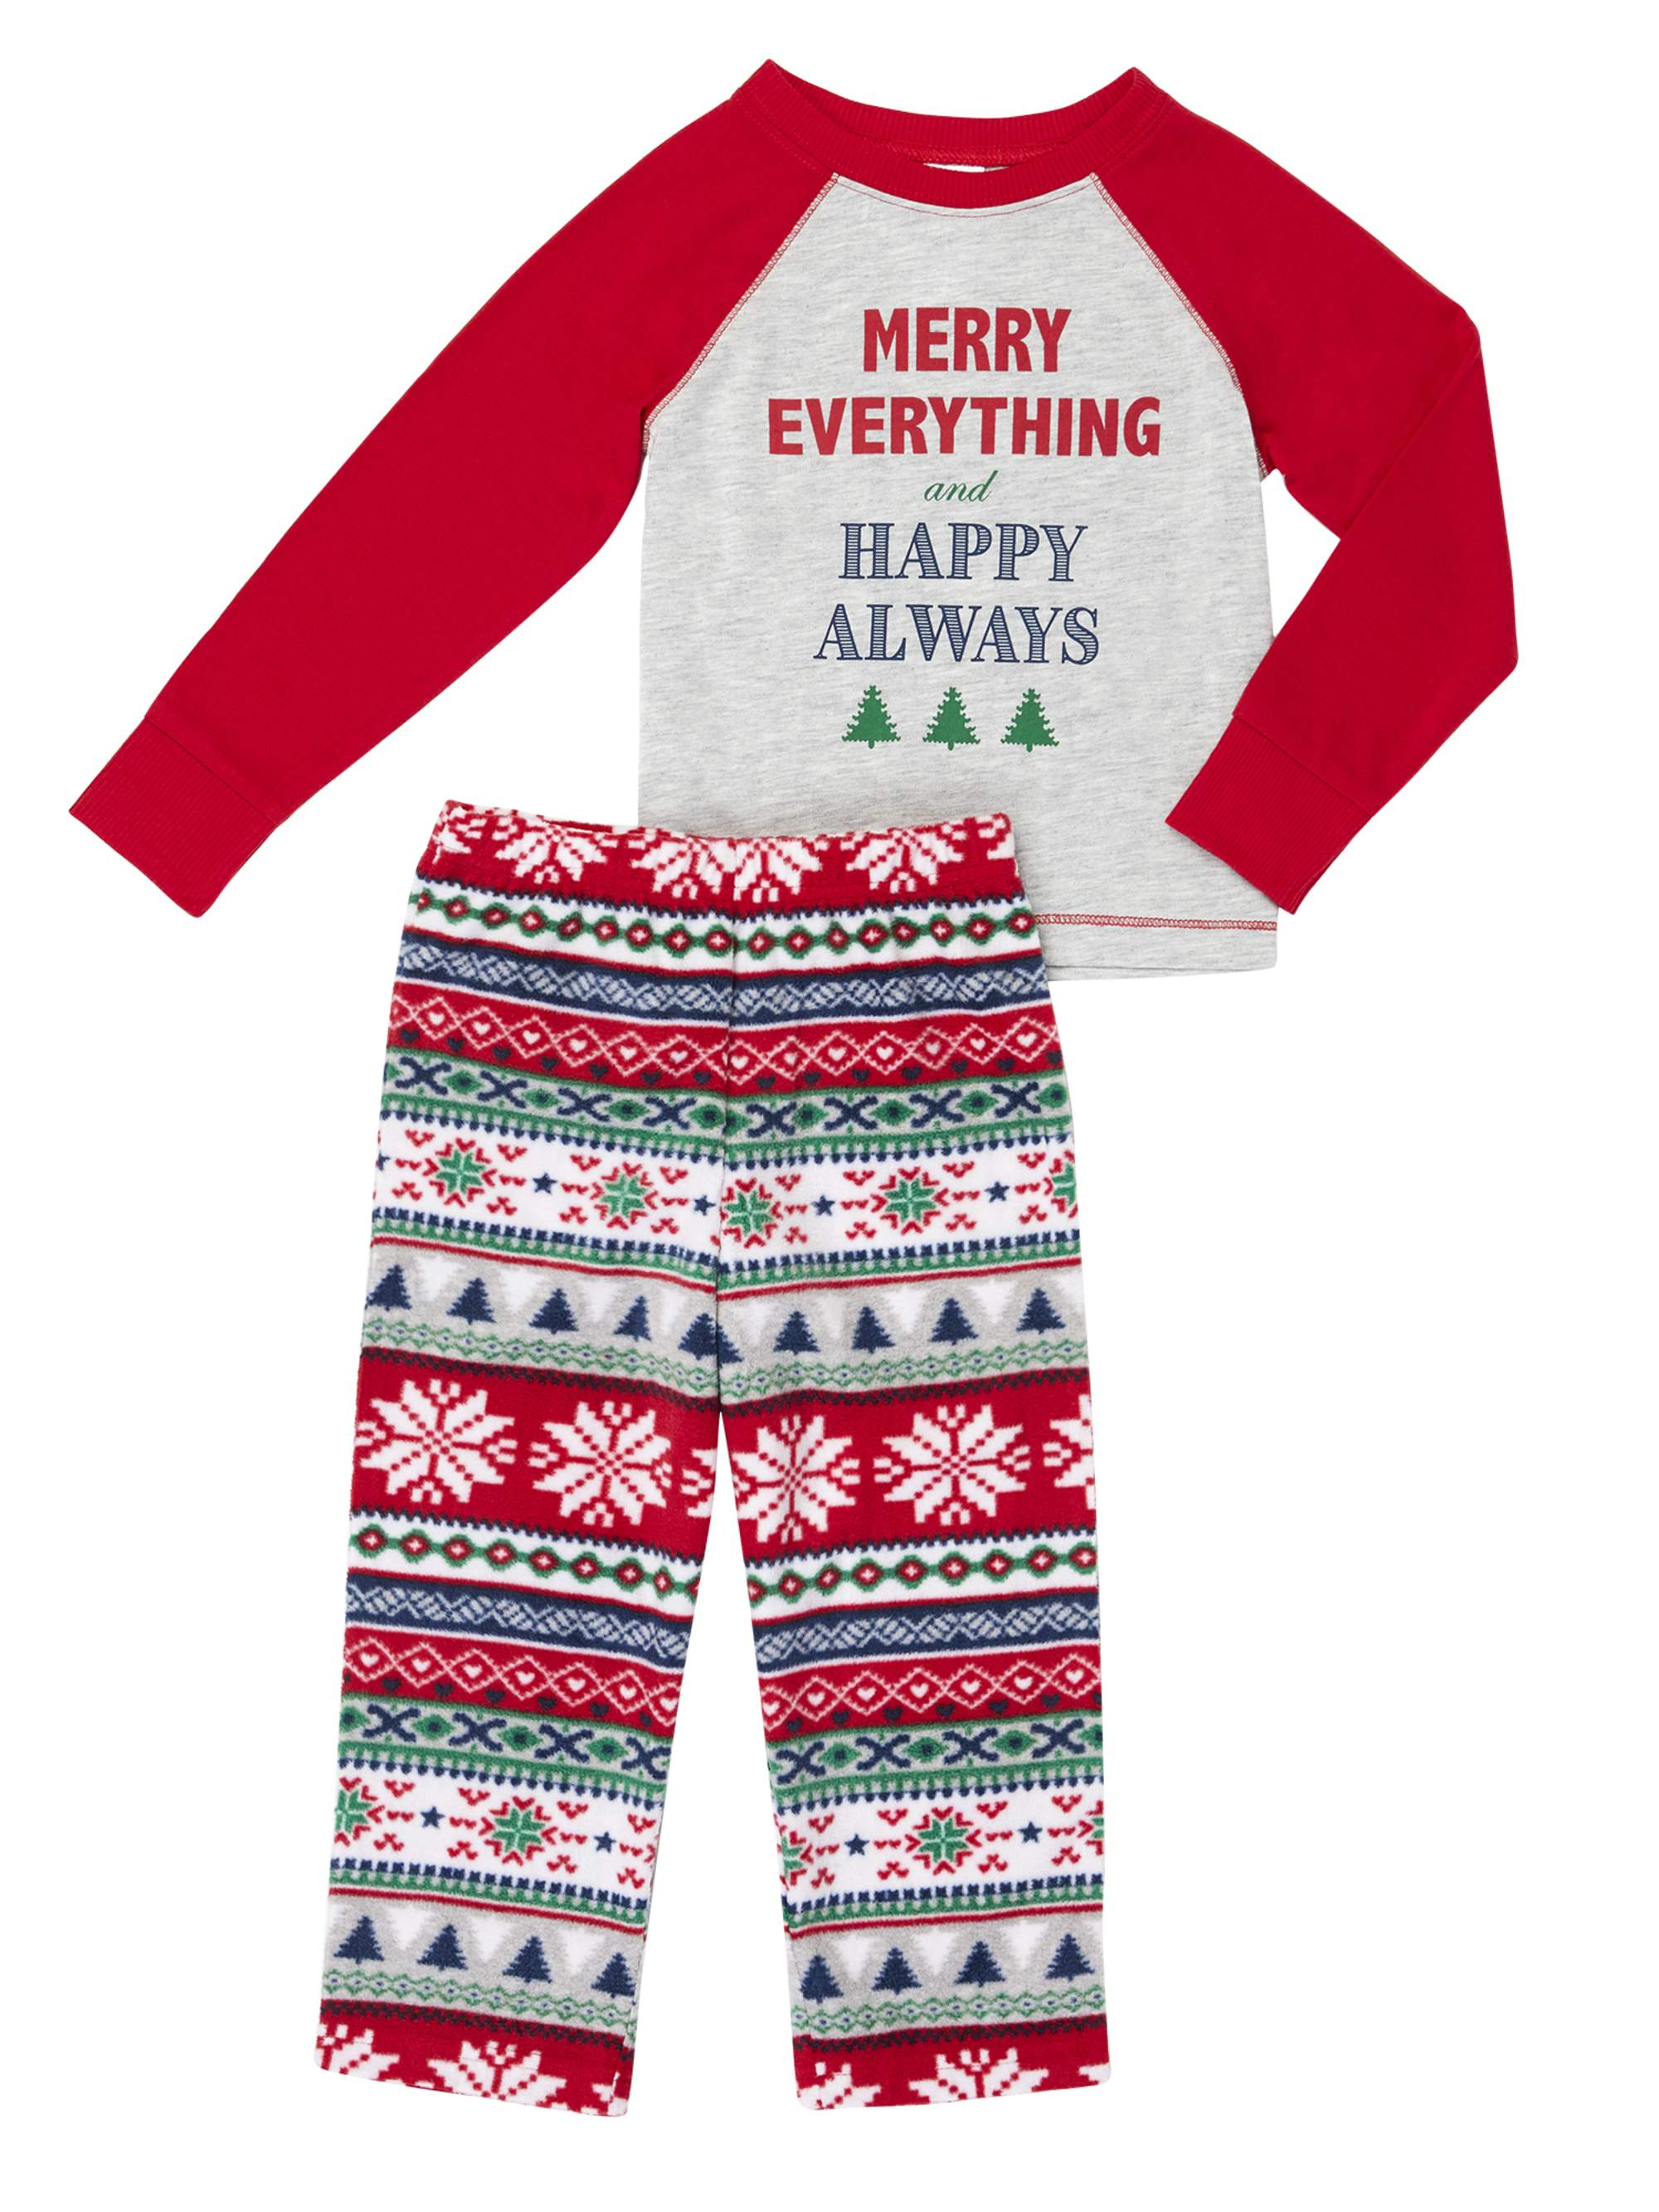 dd99b33665b6 Family Sleep Merry Everything Pajamas 2-Piece Set (Toddler Boys or ...